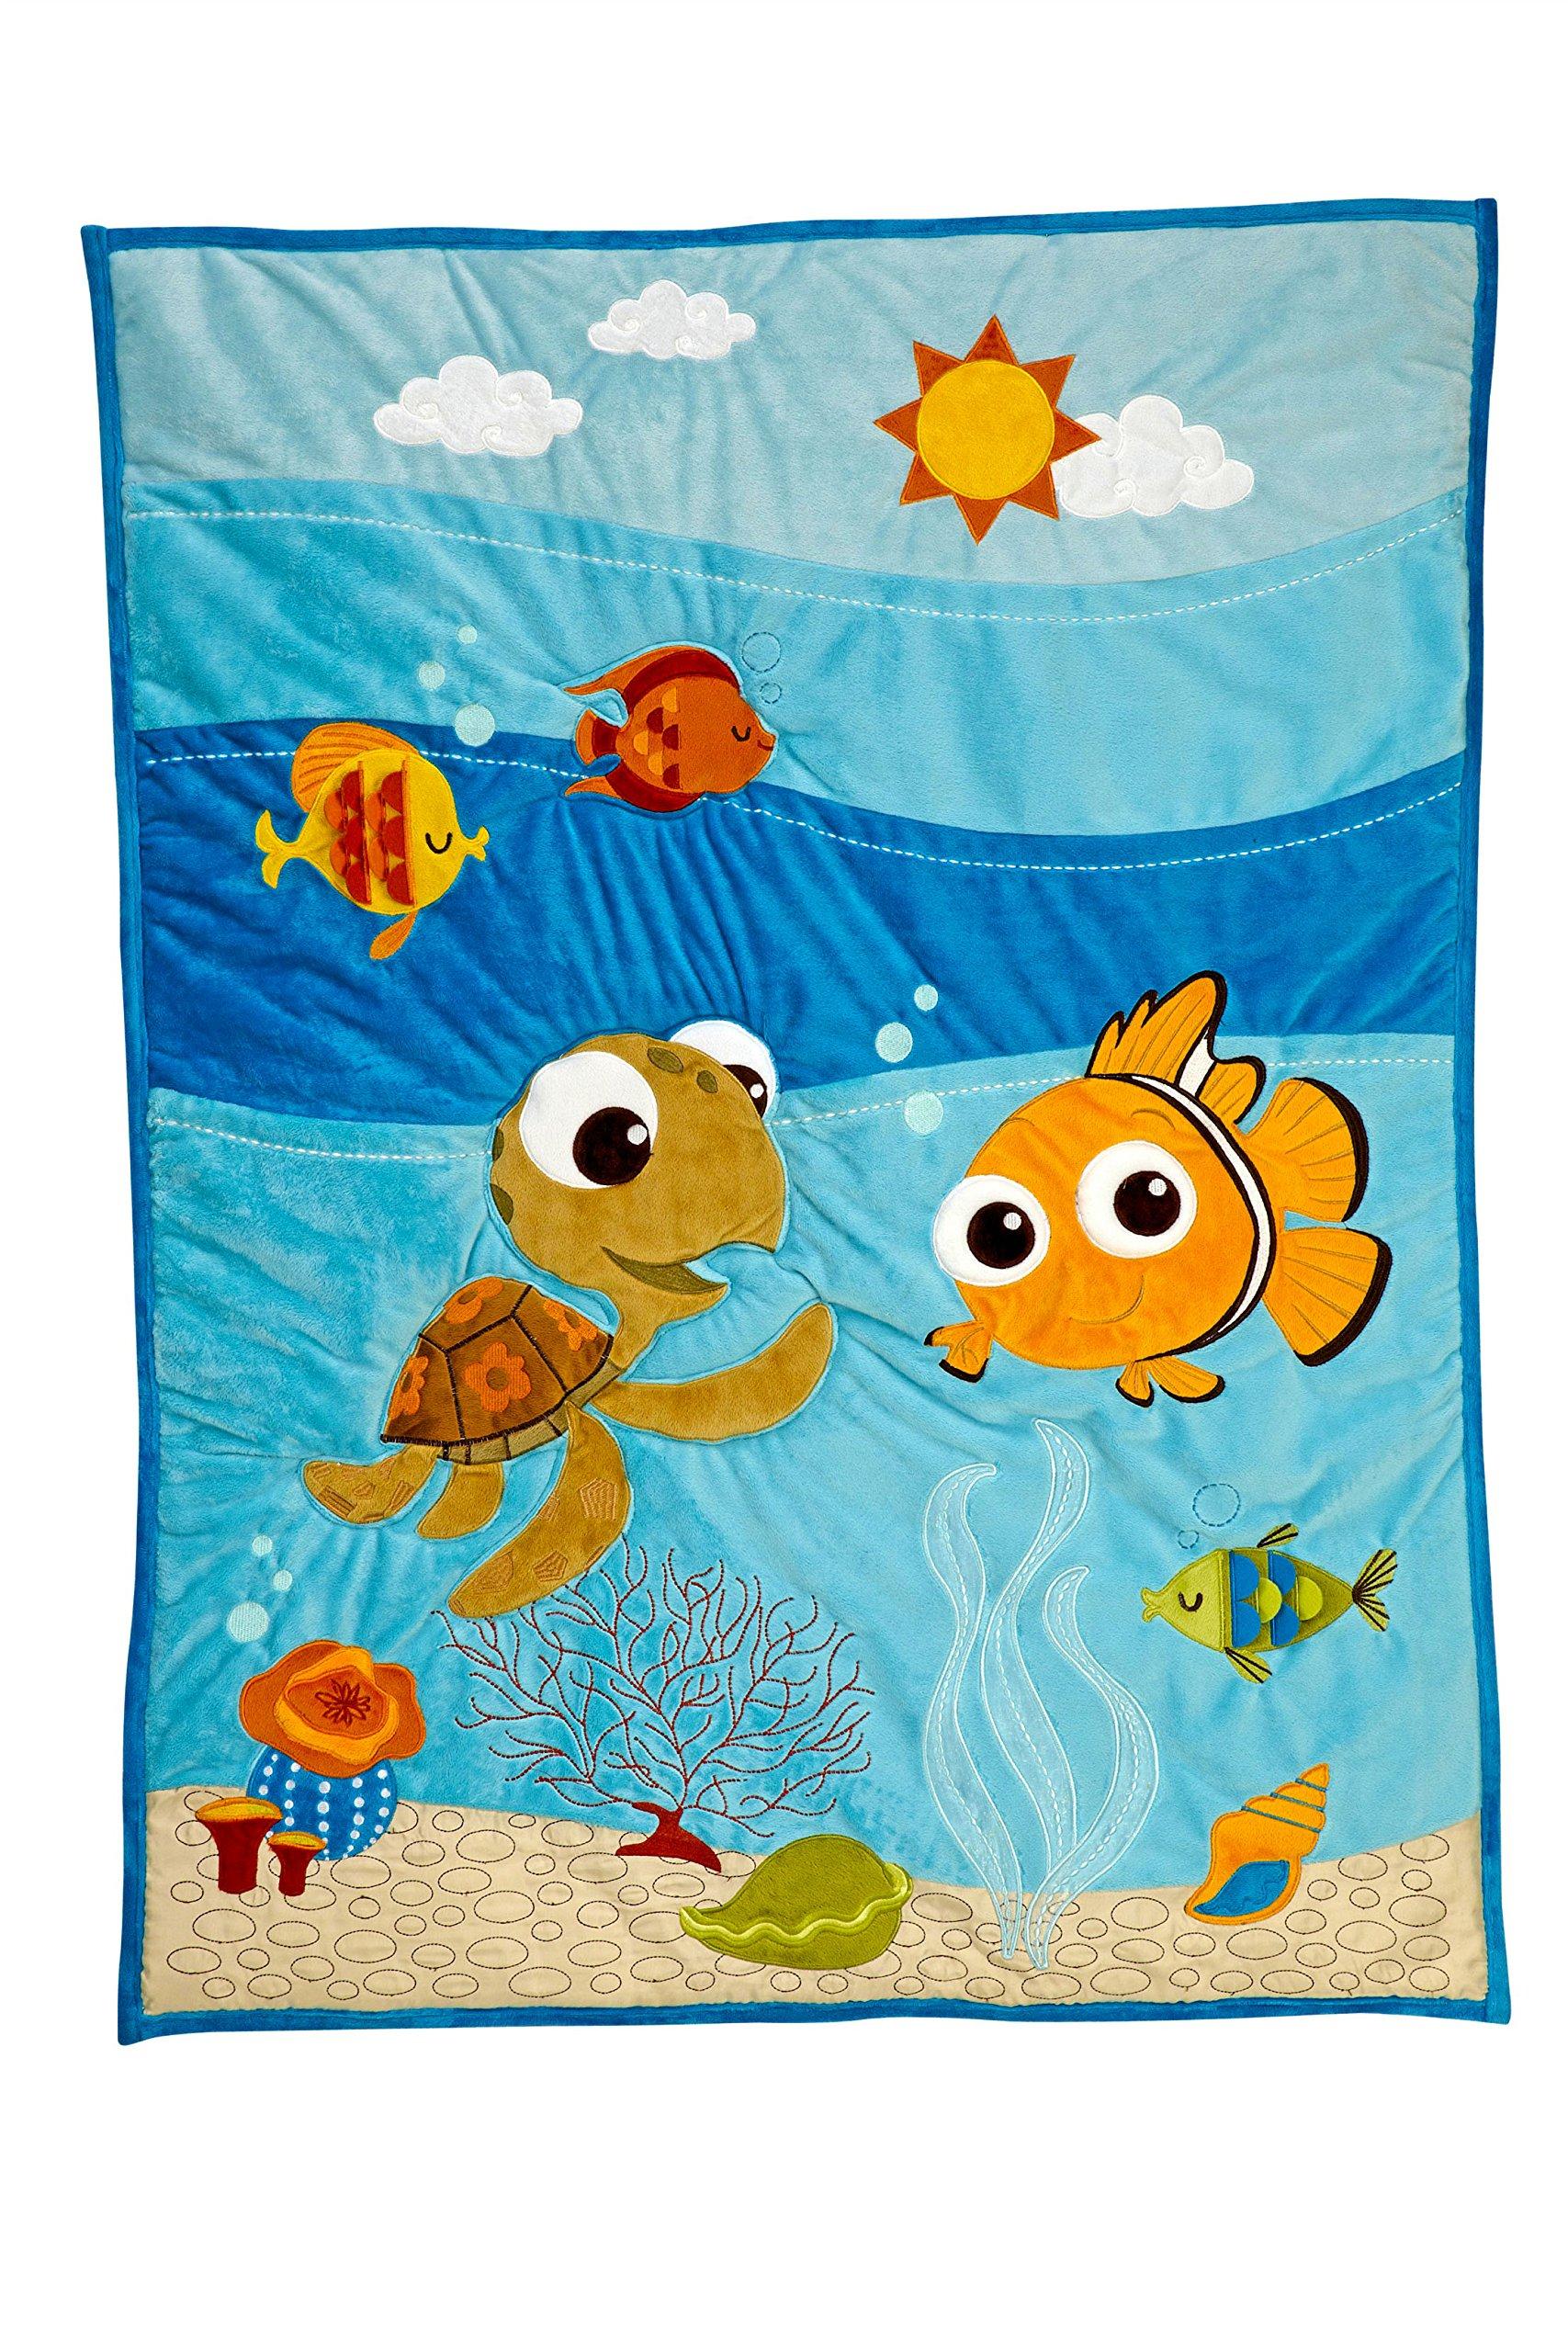 Disney Finding Nemo Applique Luxury Quilt (Crib Comforter Only)